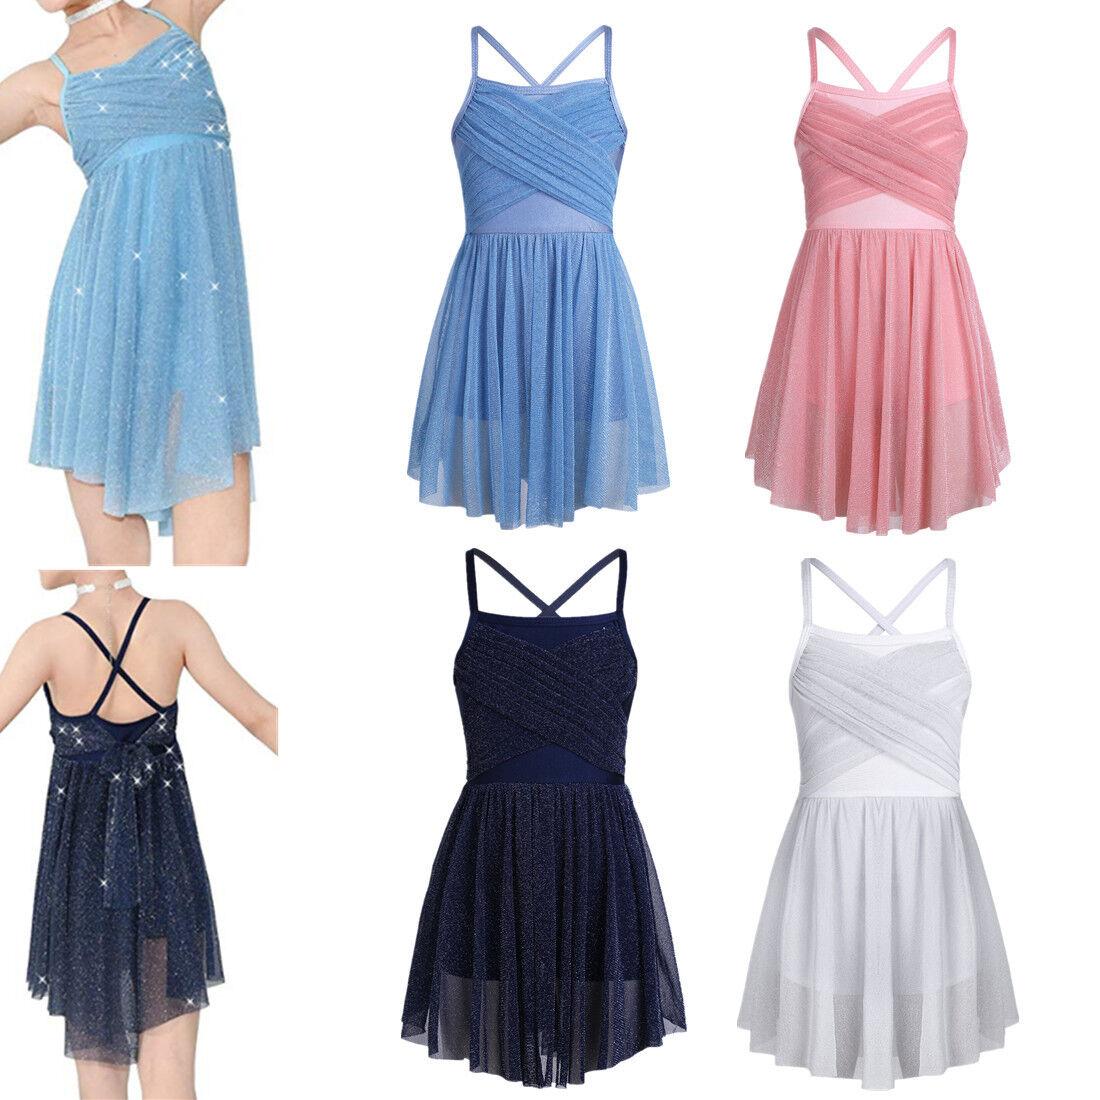 Kids Girls Ballet Dress Leotard Tutu Skirts Lyrical Dance Ballroom Dancewear